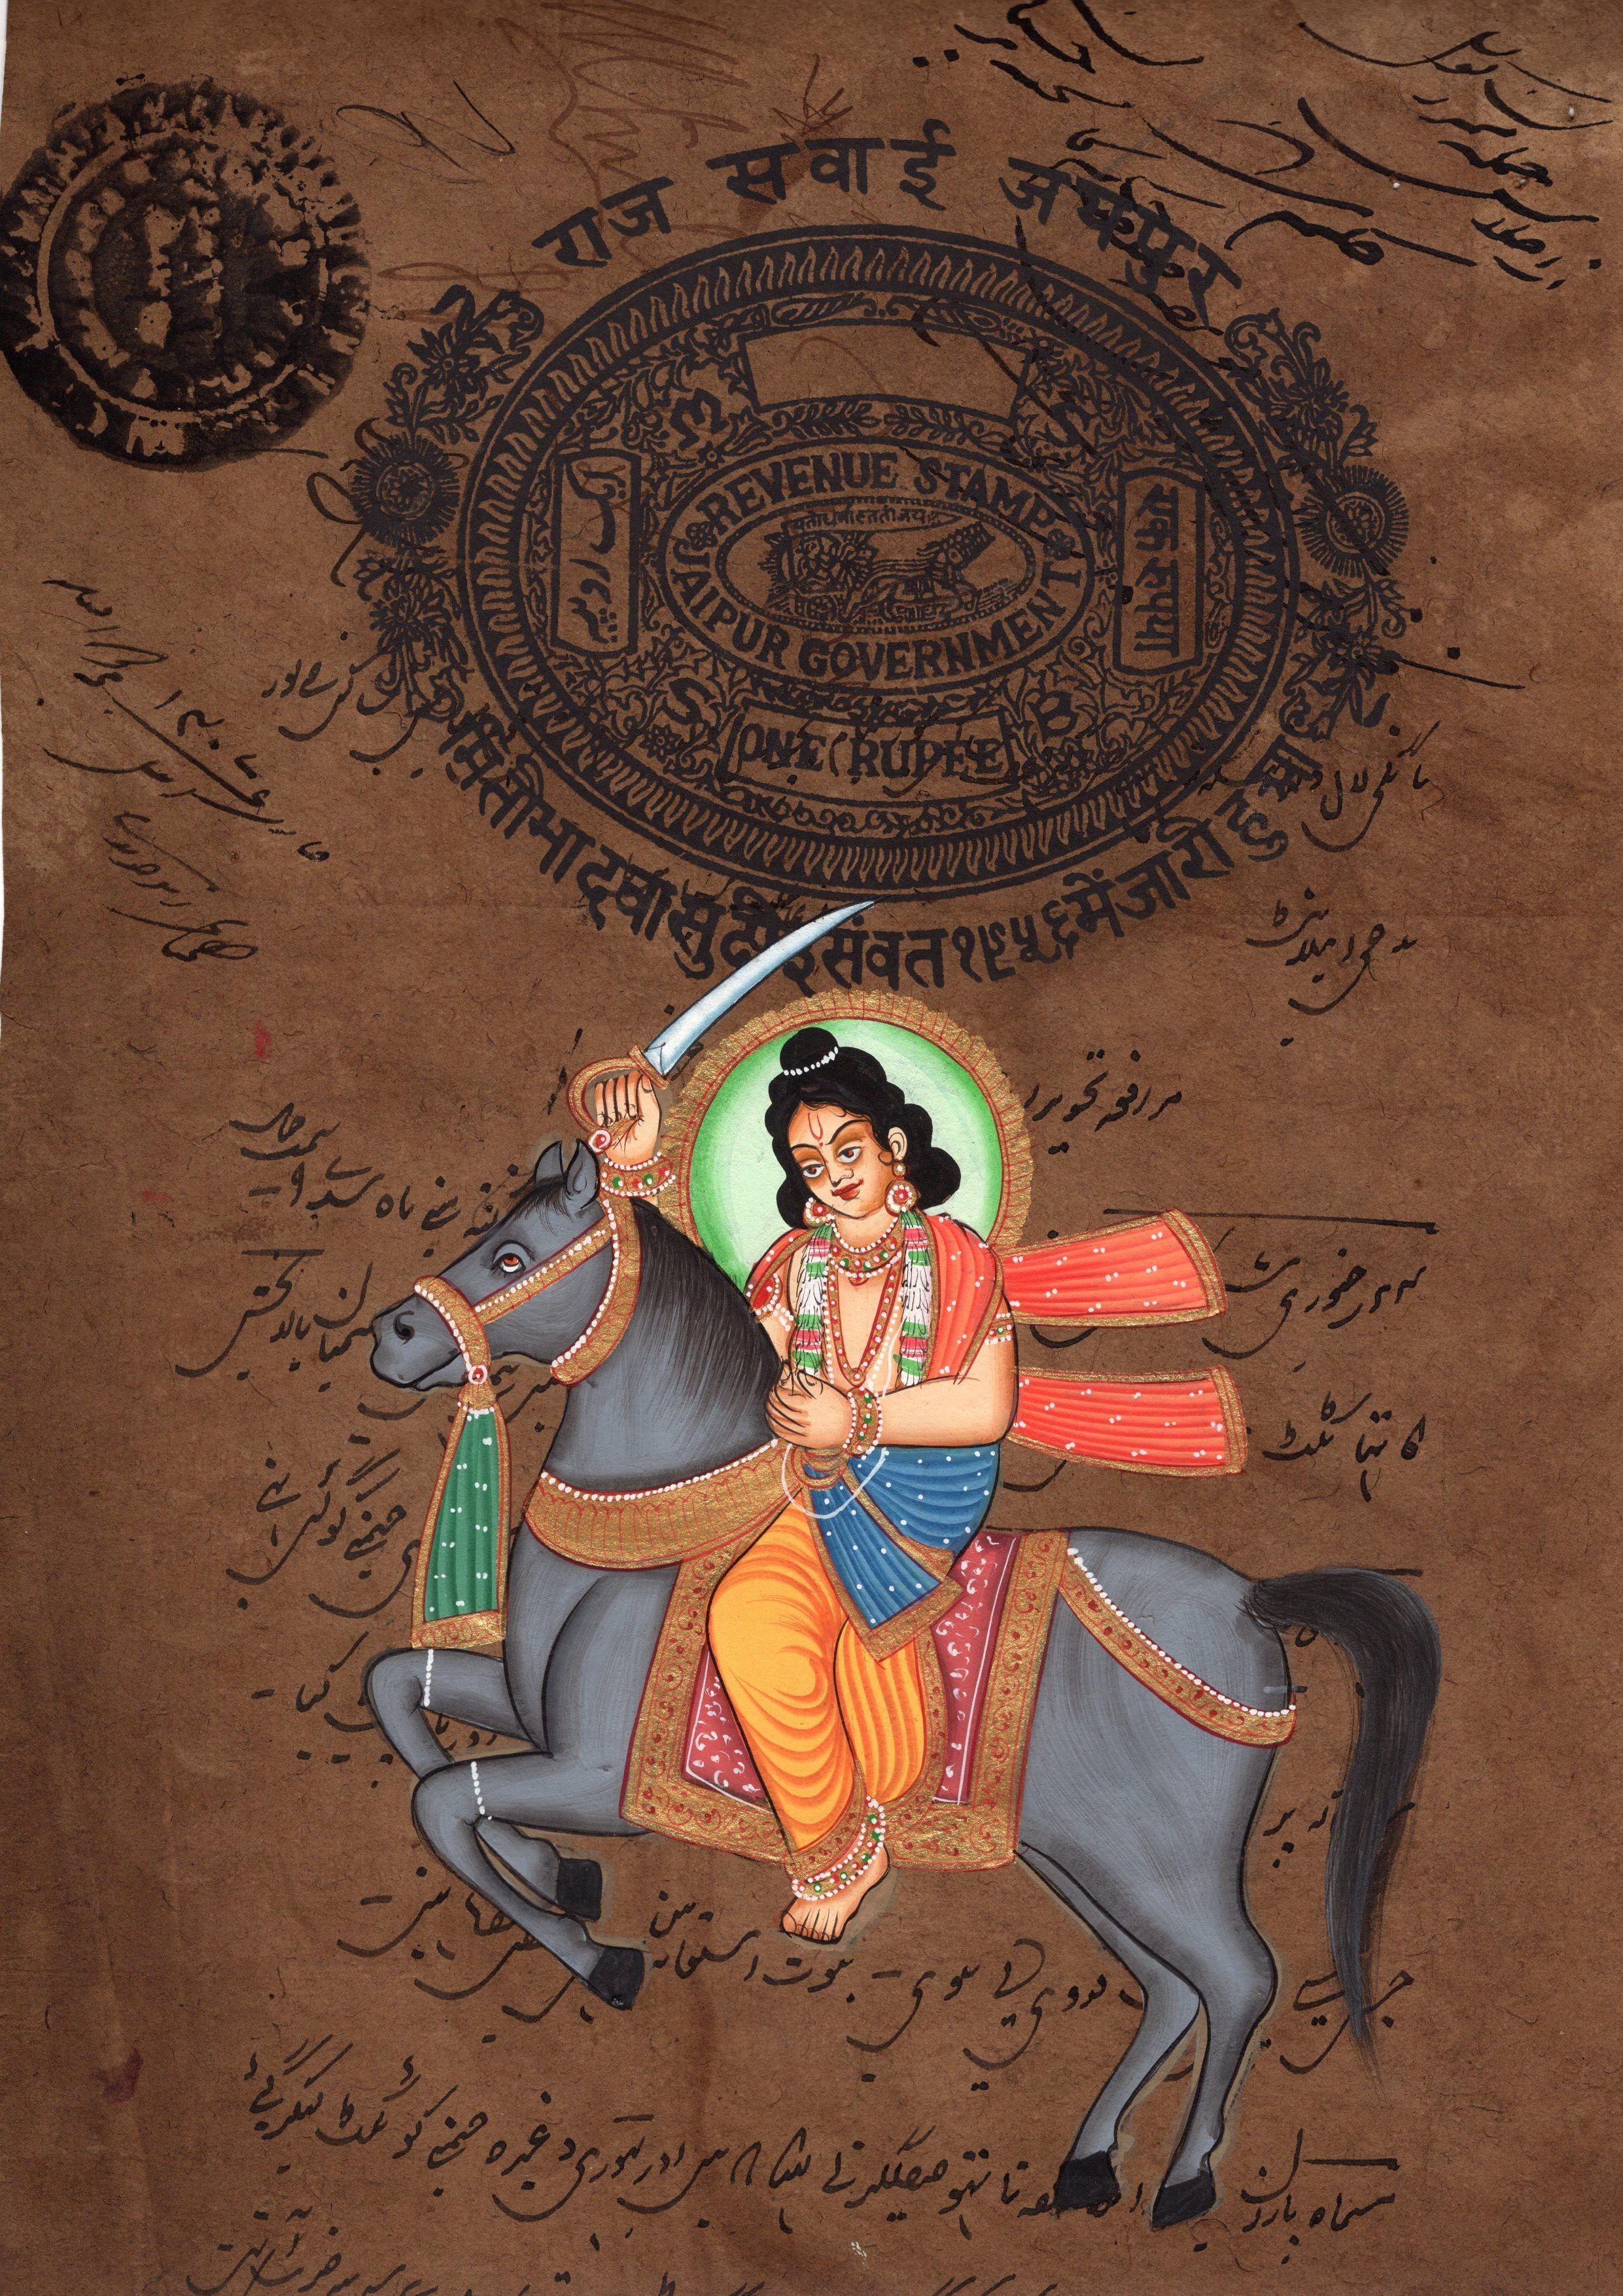 Avatar Papercraft Kalki Tenth Vishnu Avatar Painting Handmade Stamp Paper Indian Hindu